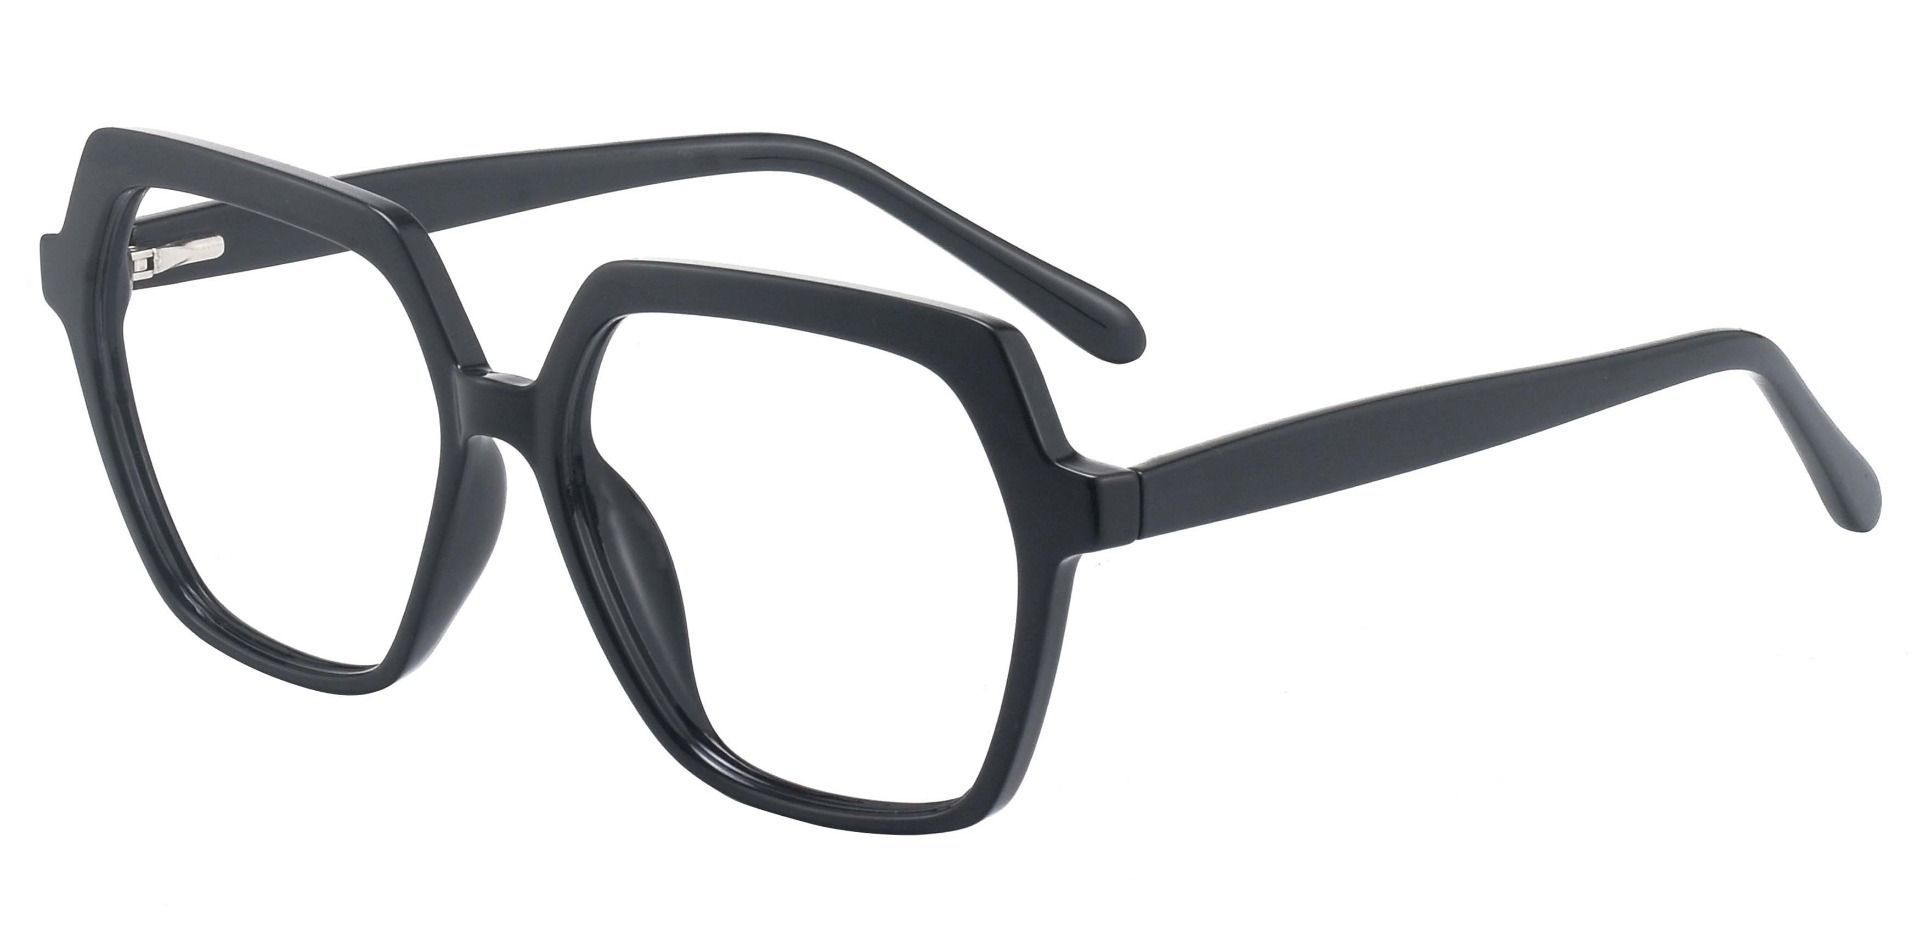 Regent Geometric Prescription Glasses - Black